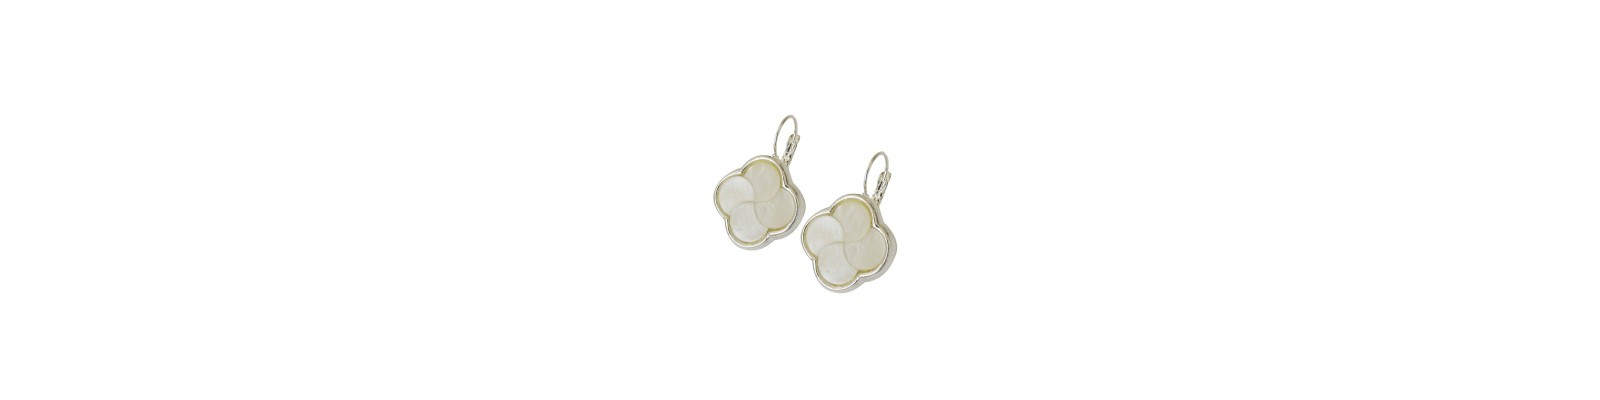 Lever back Earrings \u201cHeart n Sole\u201d wPewter Flip Flops /& Iris *Aurora Borealis Beads.